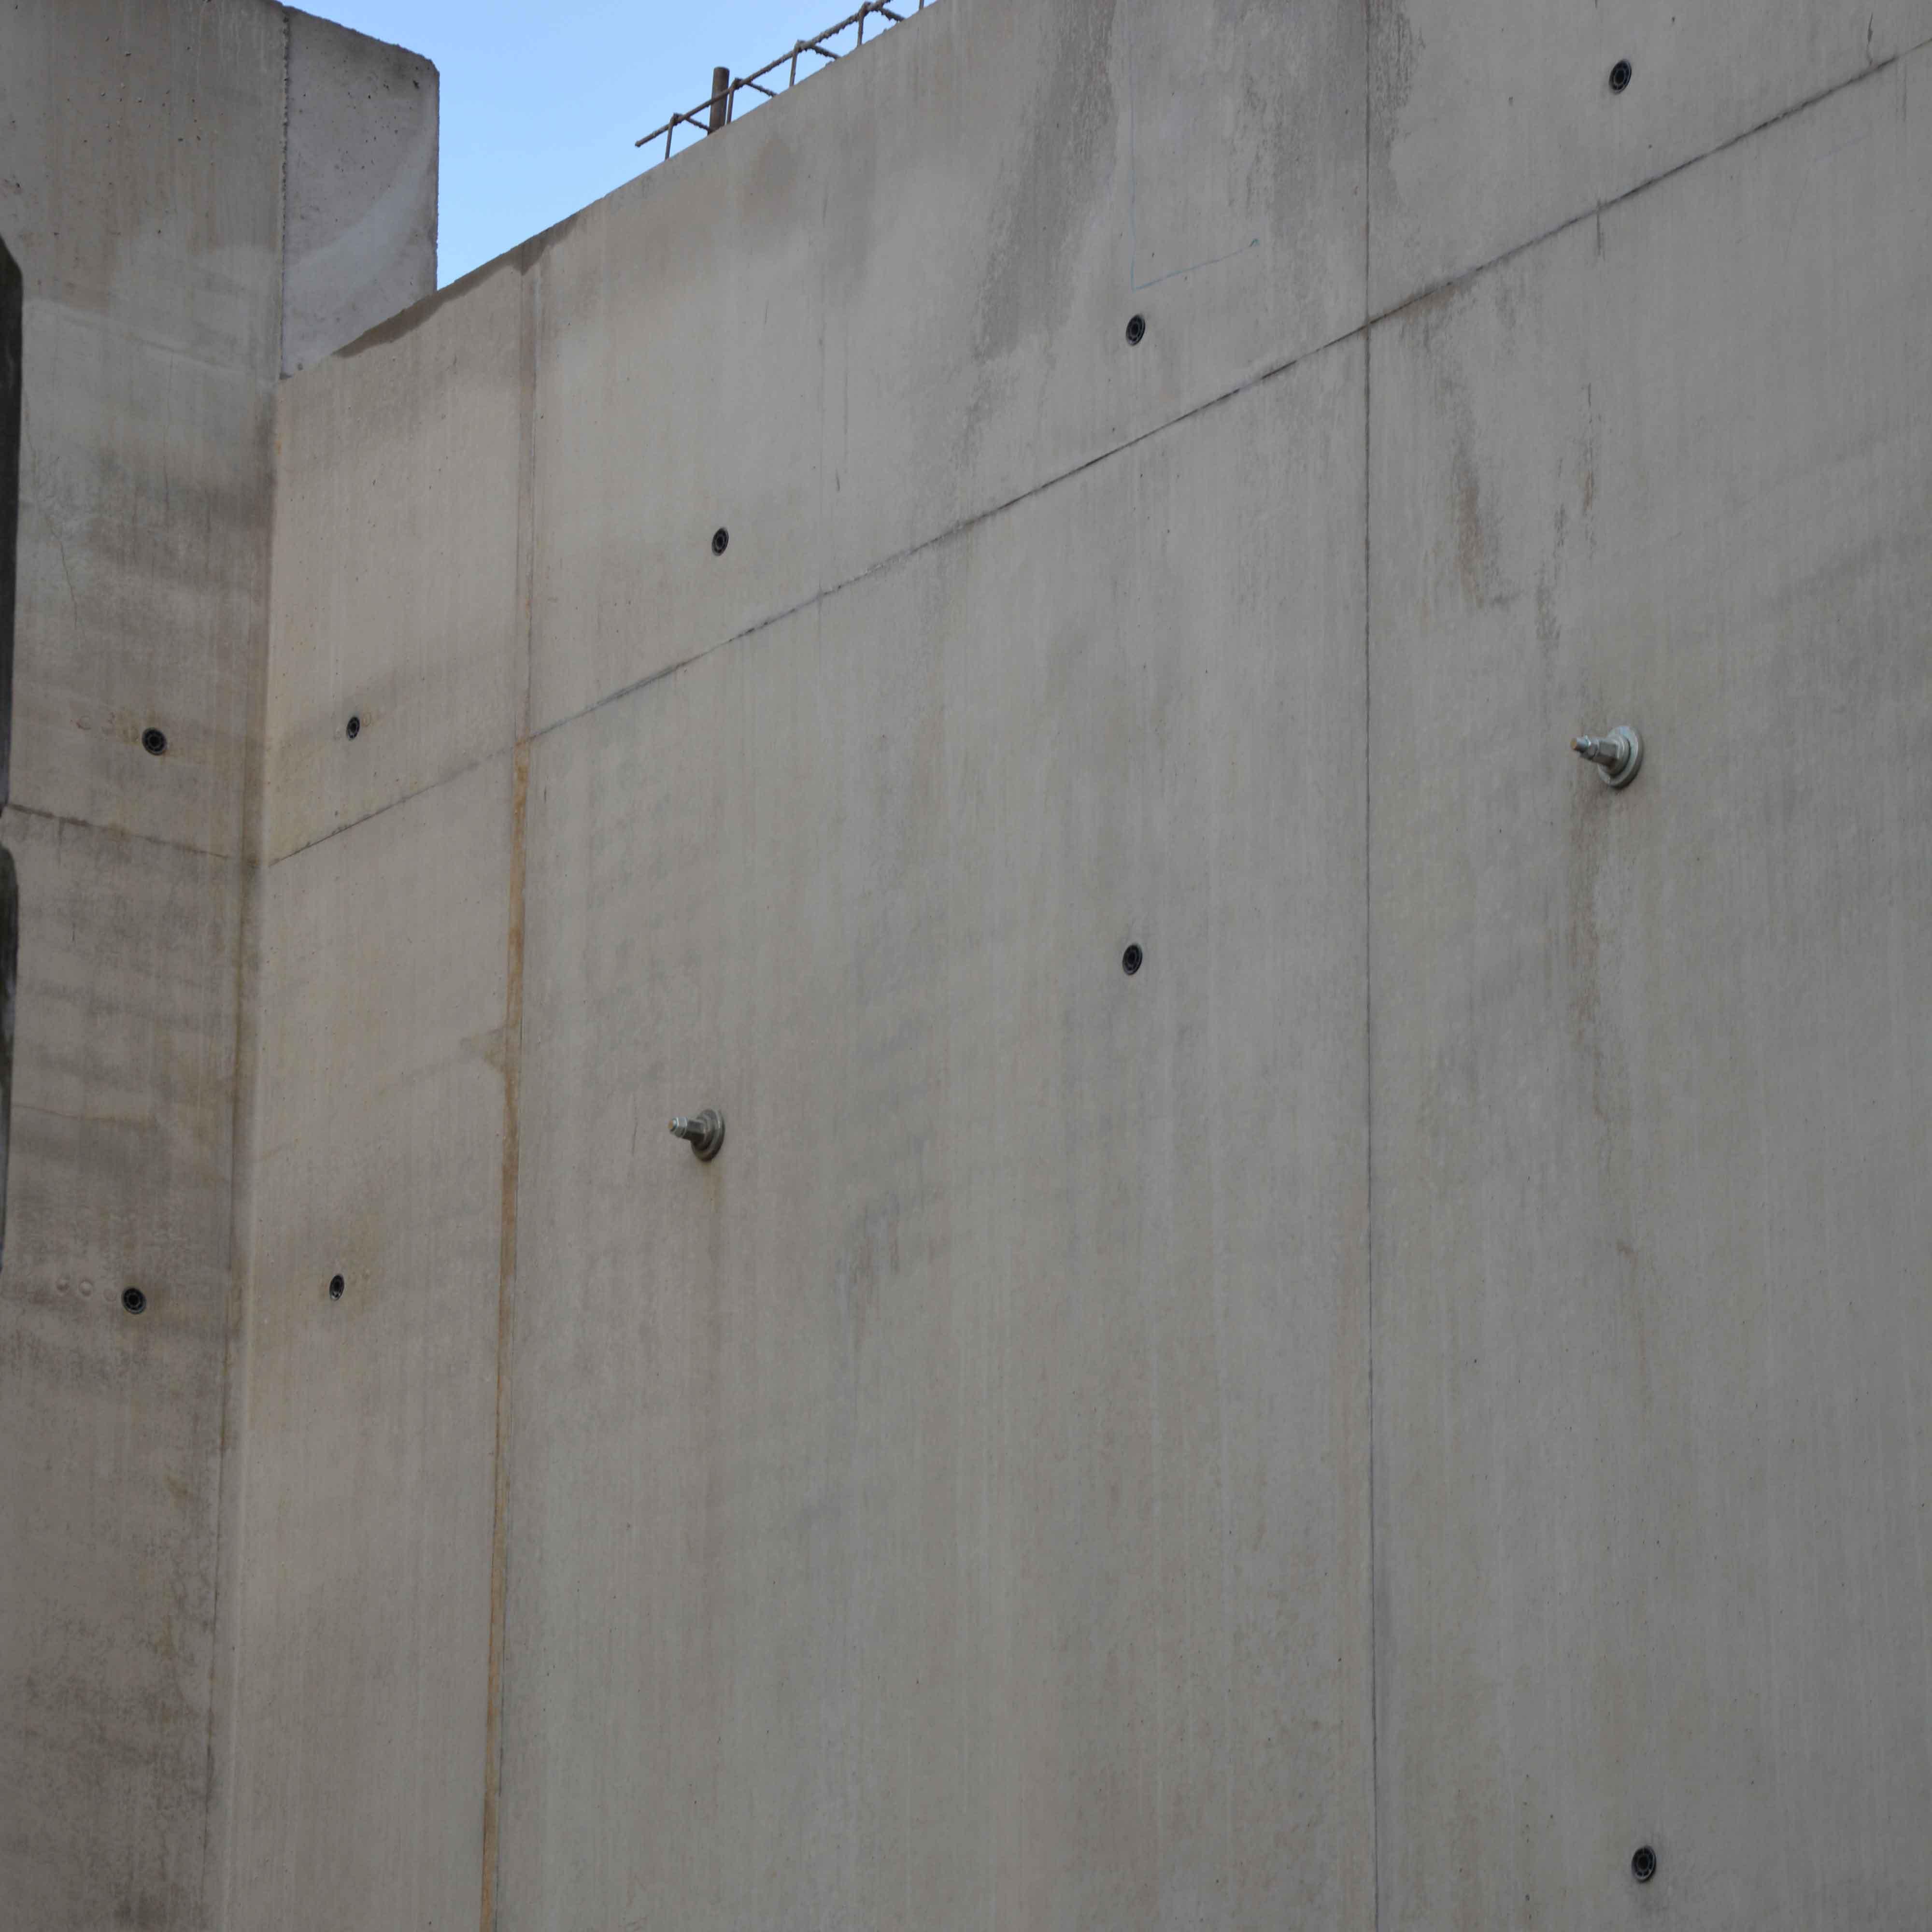 Banche SC 9015 - CHANTIER MUSEE DU VERRE SARS POTERIES